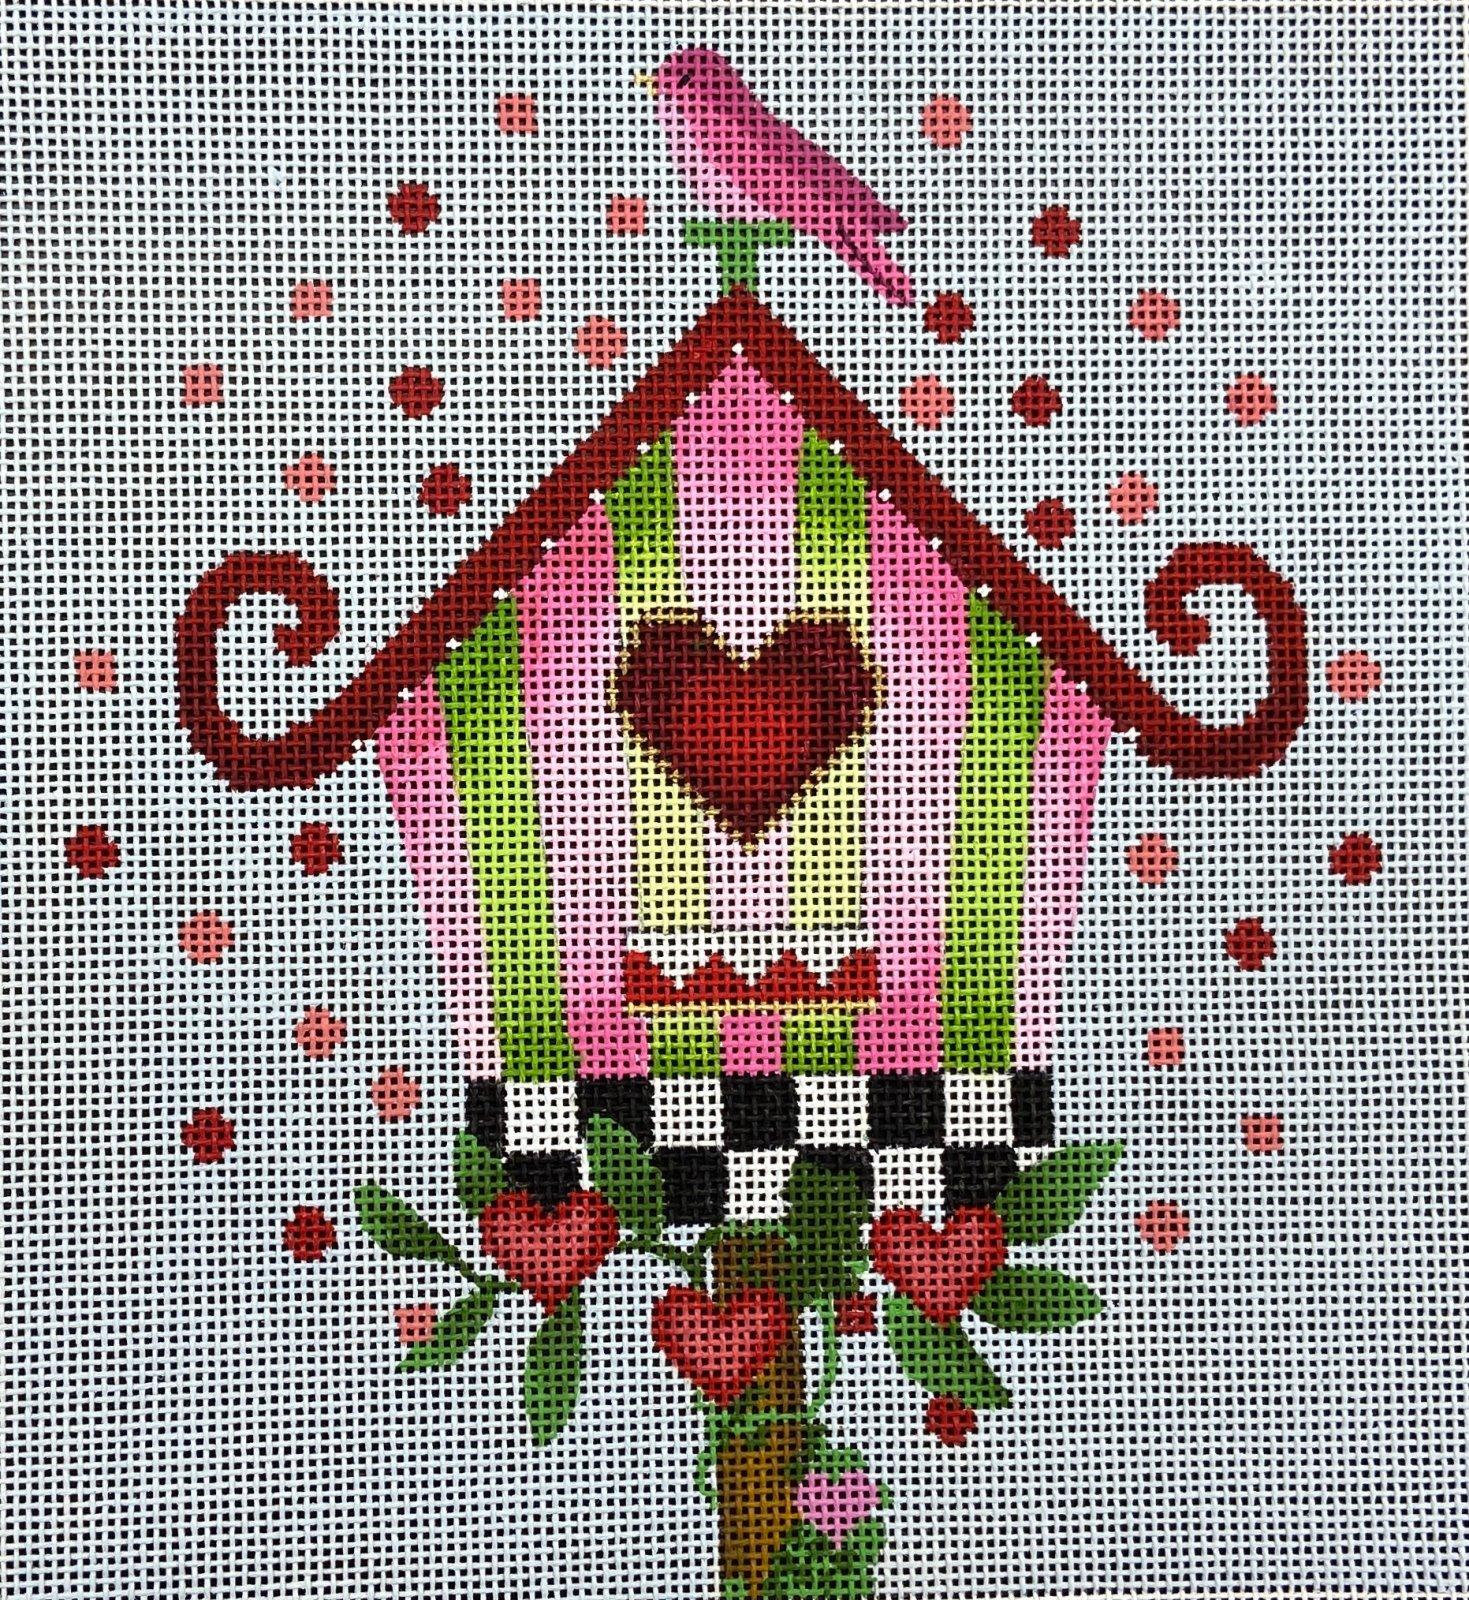 MS2210B Striped Birdhouse Melissa Shirley